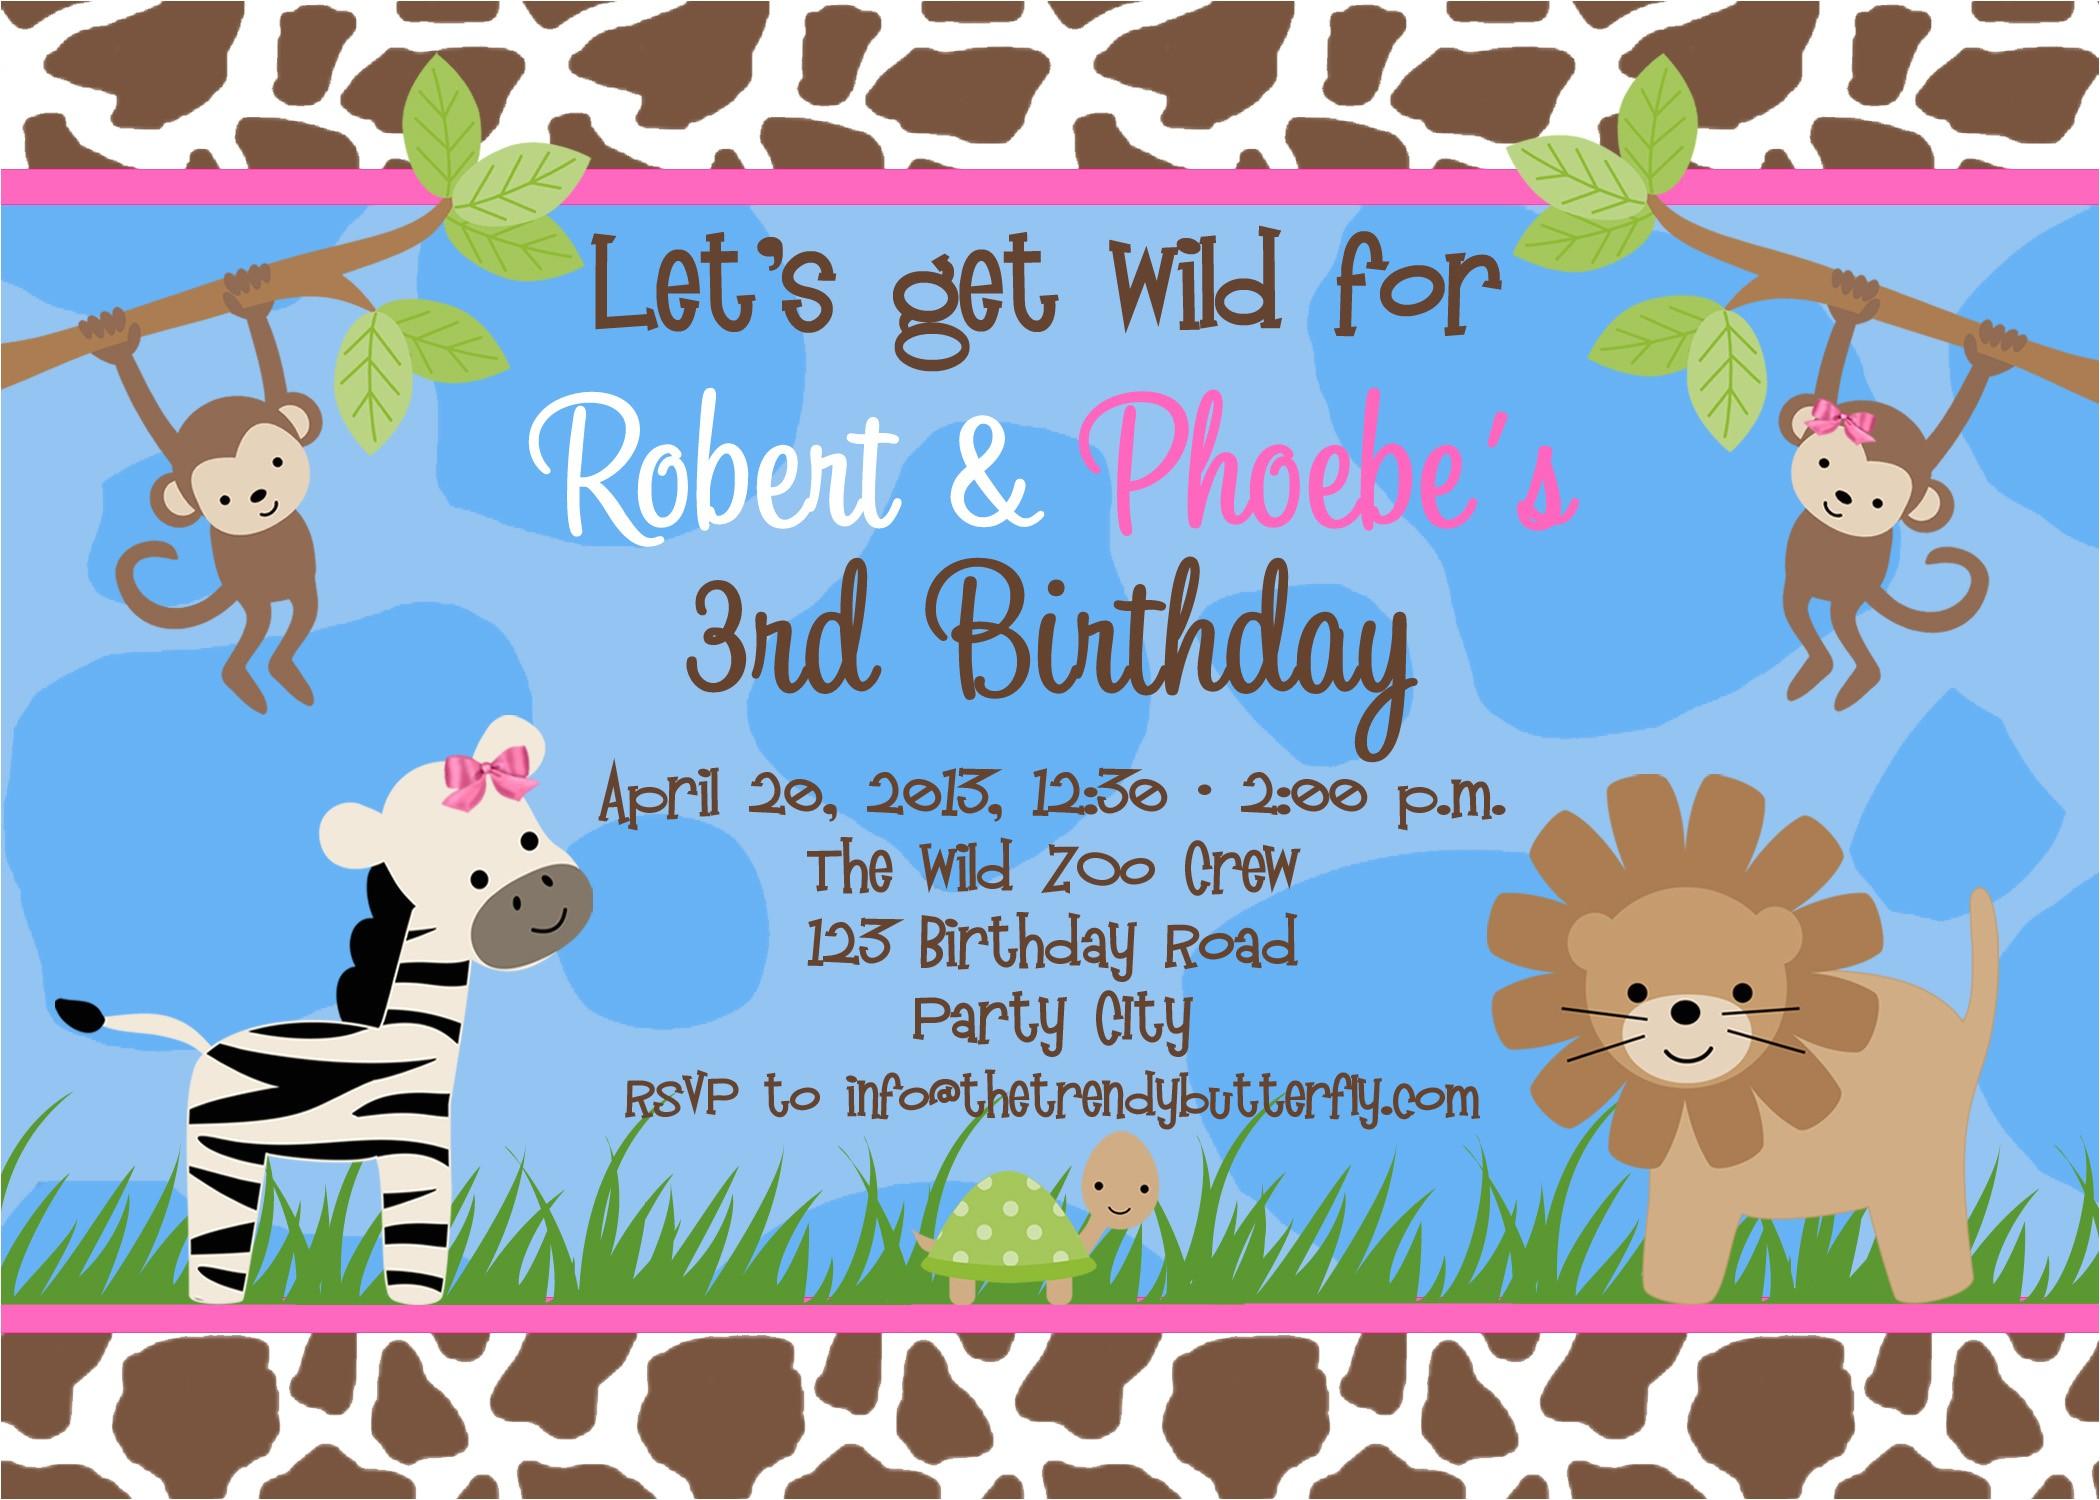 Birthday Party Invitation Template Free Free Birthday Party Invitation Templates Free Invitation